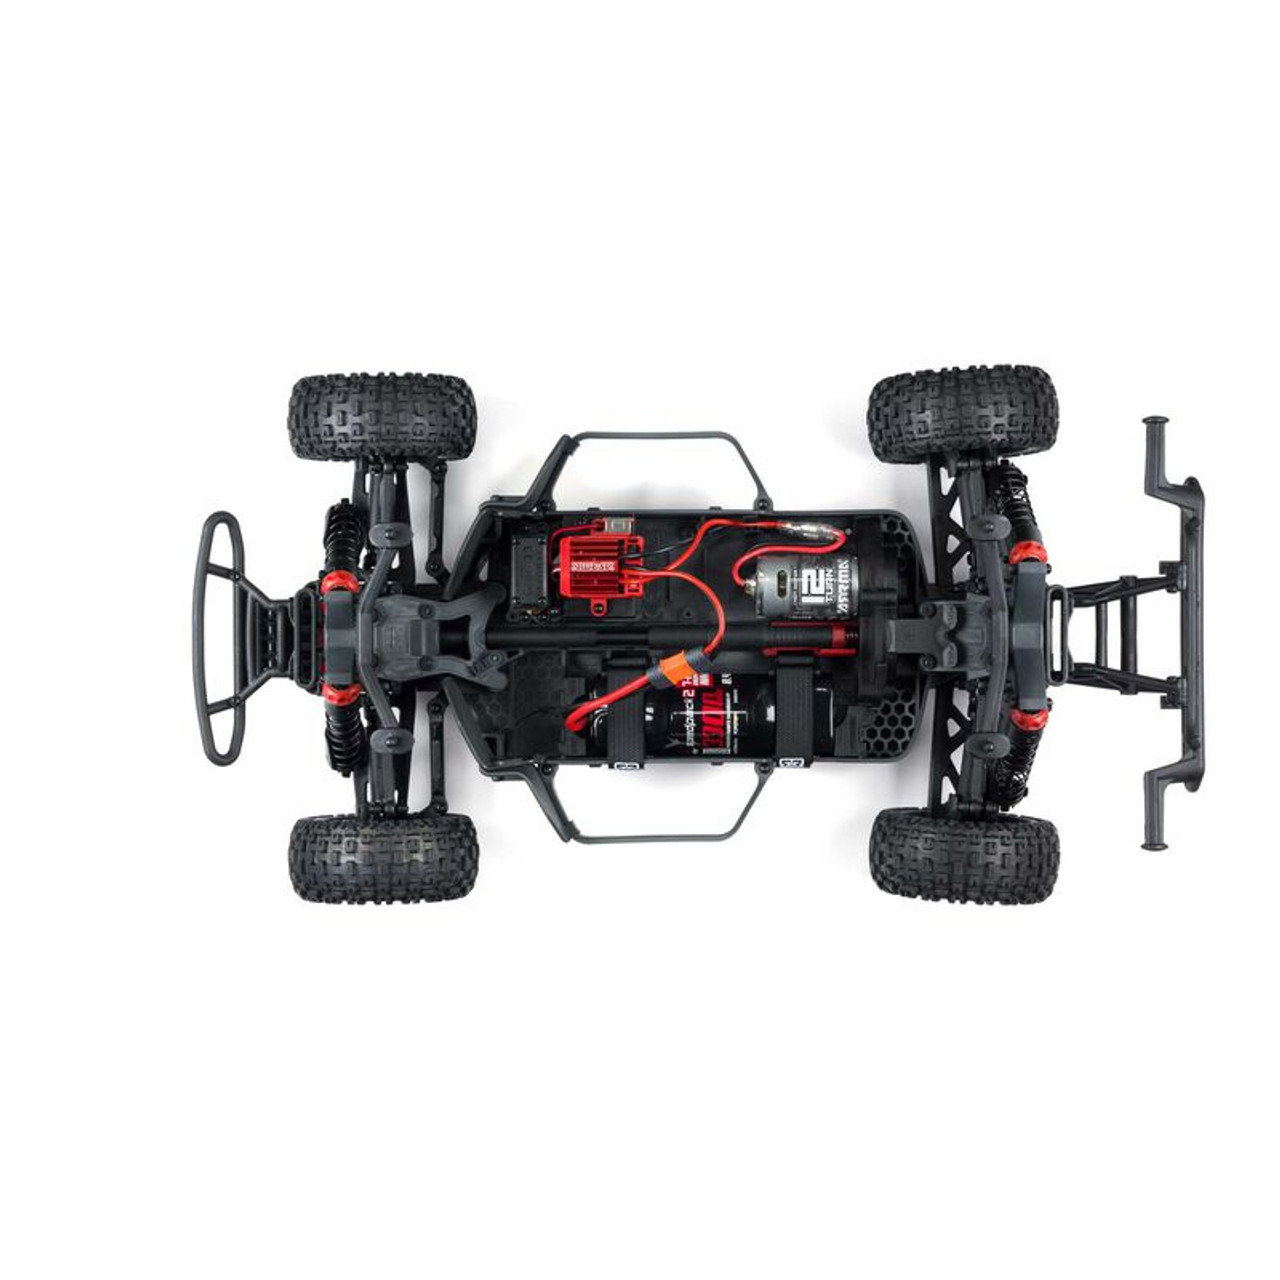 Arrma Senton 4x4 V3 550 Mega RTR 1/10 Short Course Truck (Red) w/ Spektrum SLT3 2.4GHz Radio